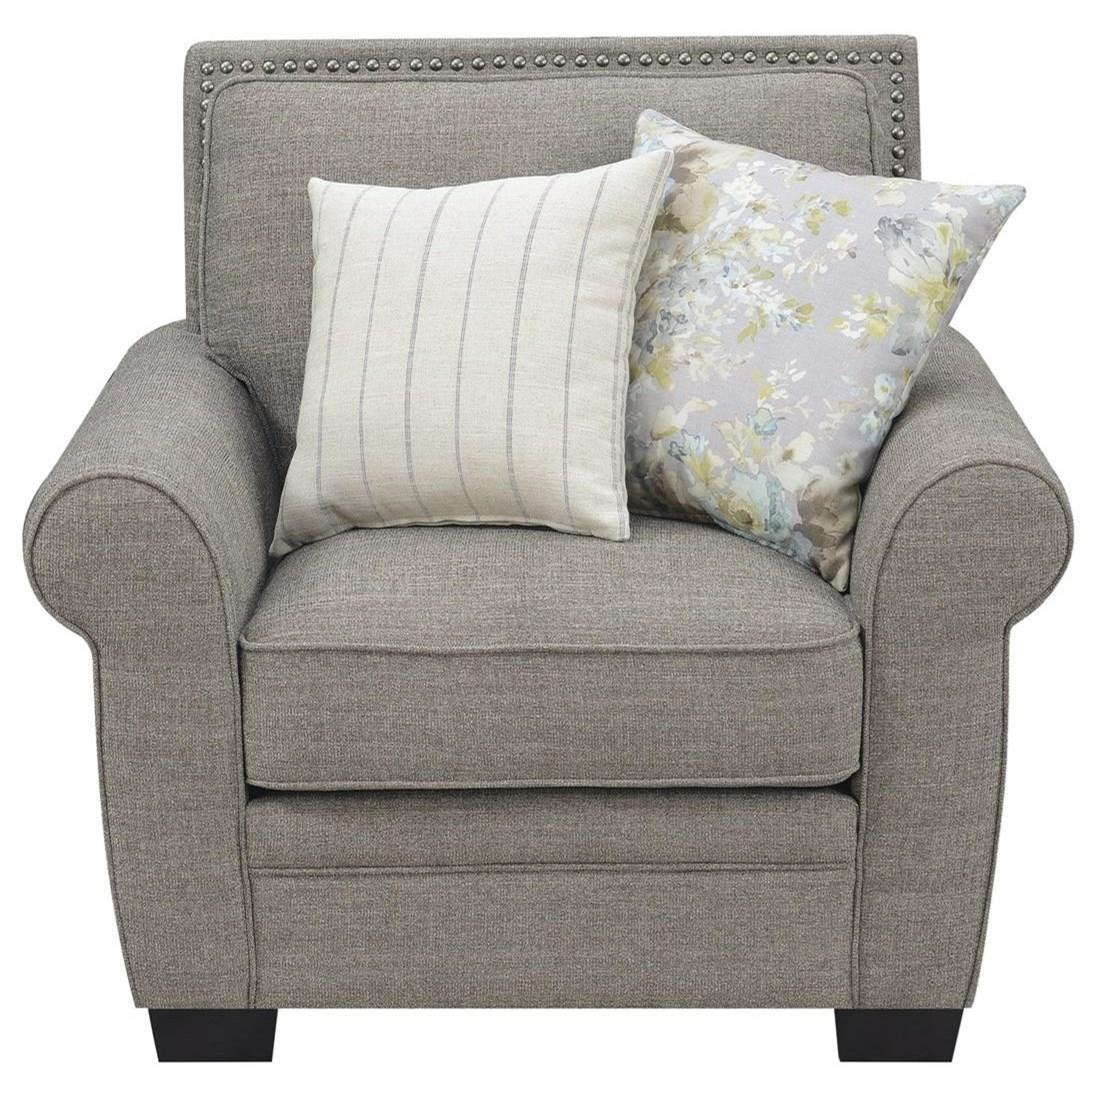 Chair W/2 Accent Pillows